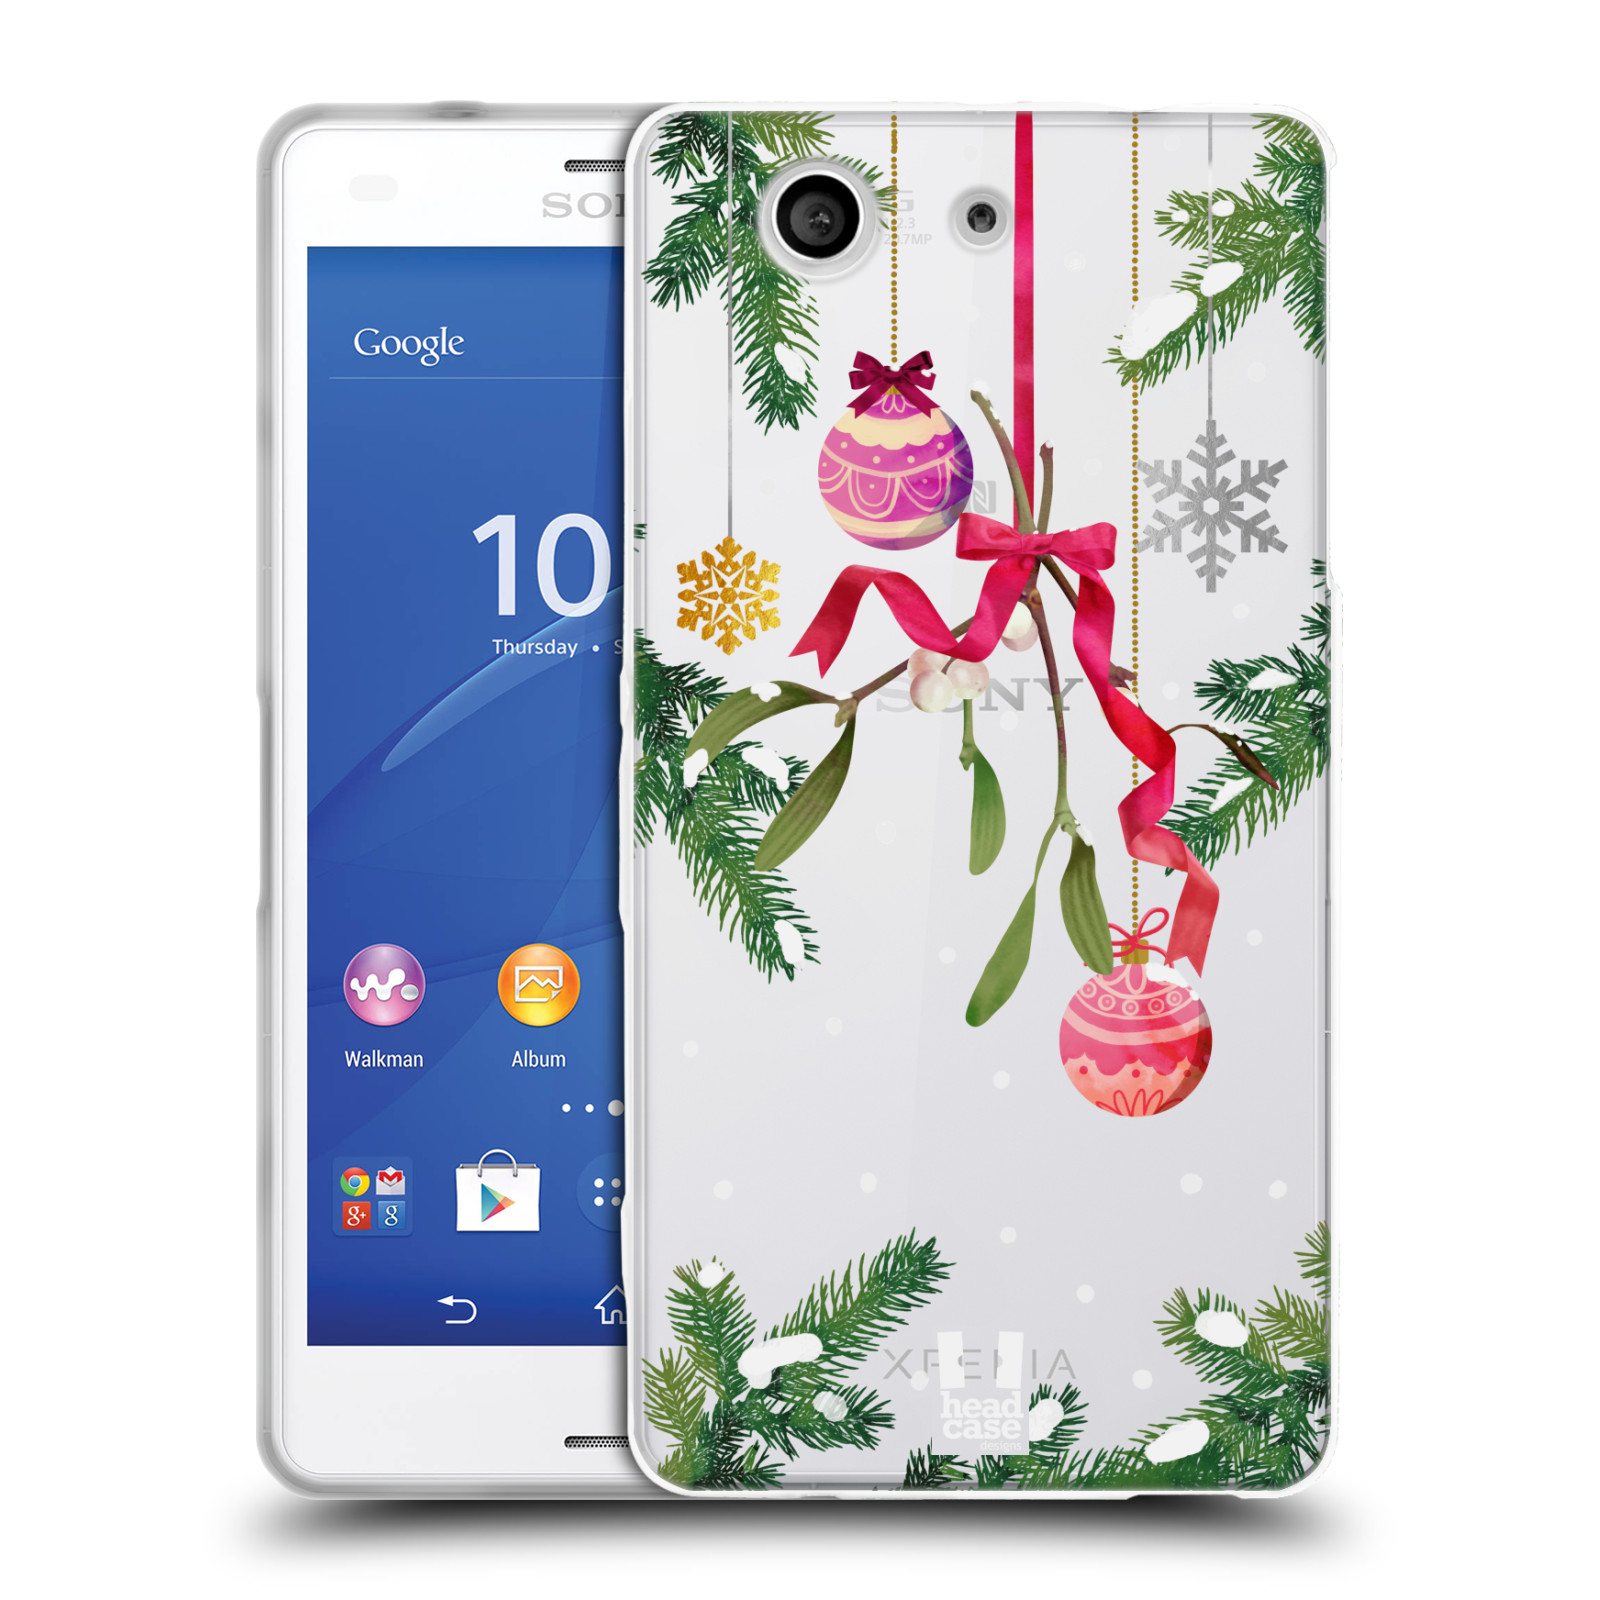 Silikonové pouzdro na mobil Sony Xperia Z3 Compact D5803 - Head Case - Větvičky a vánoční ozdoby